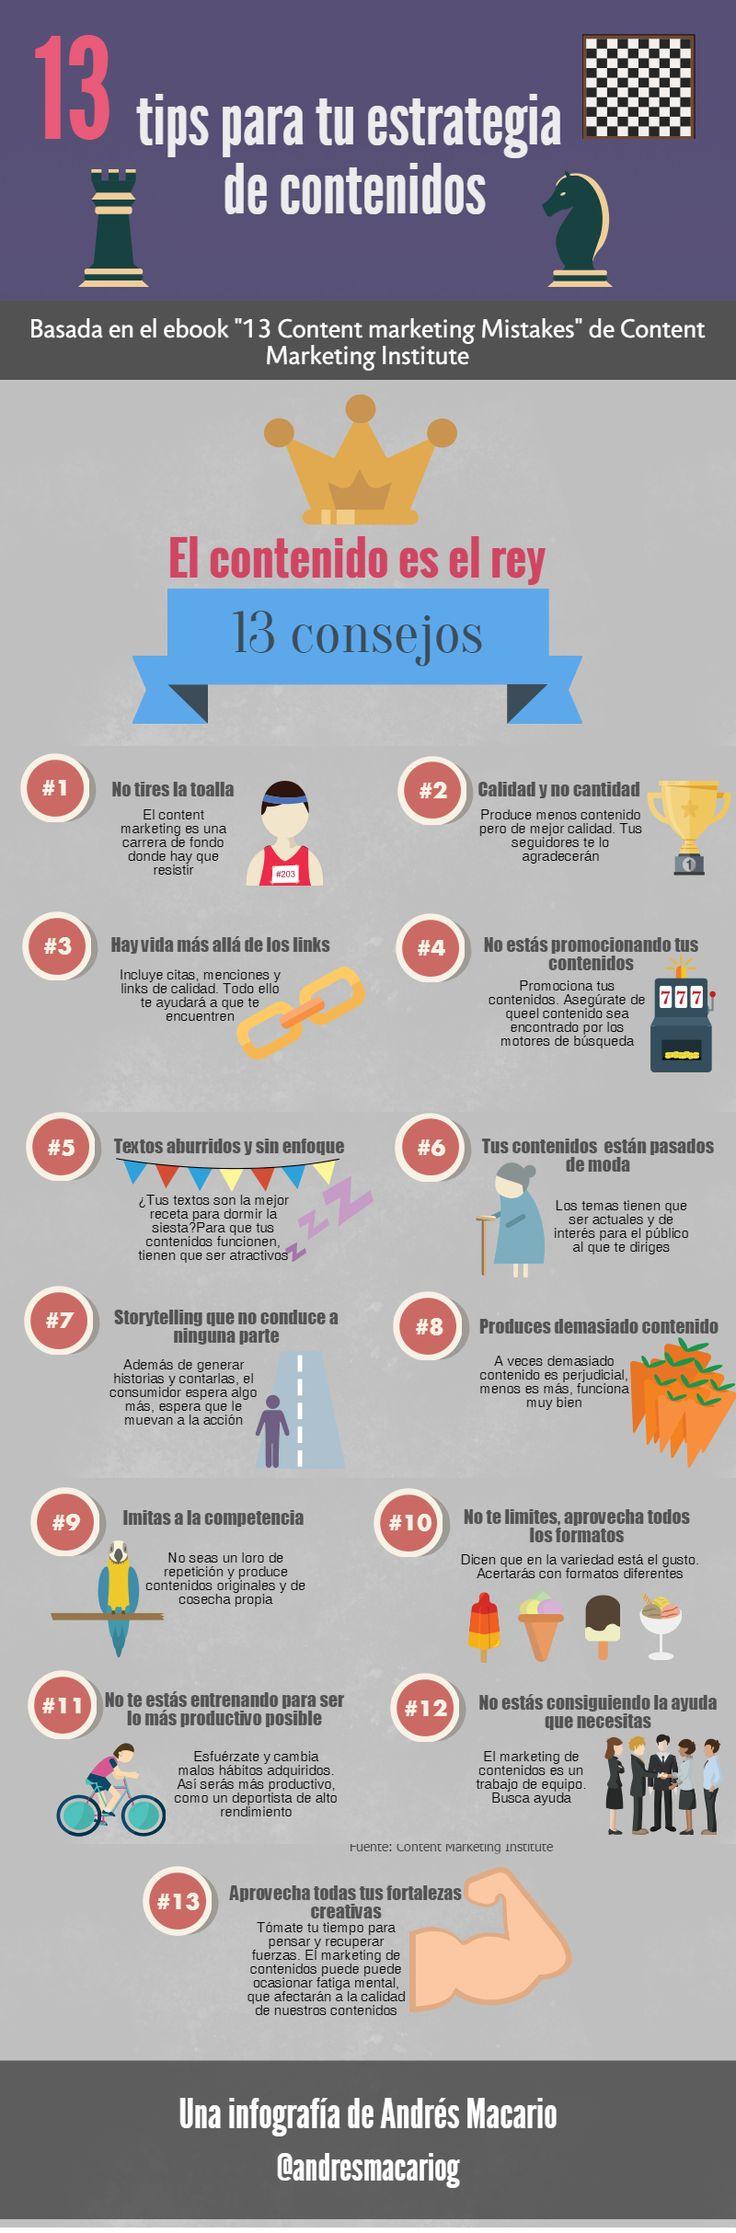 13 tips para tu estrategia de contenidos-Infografia Andres Macario